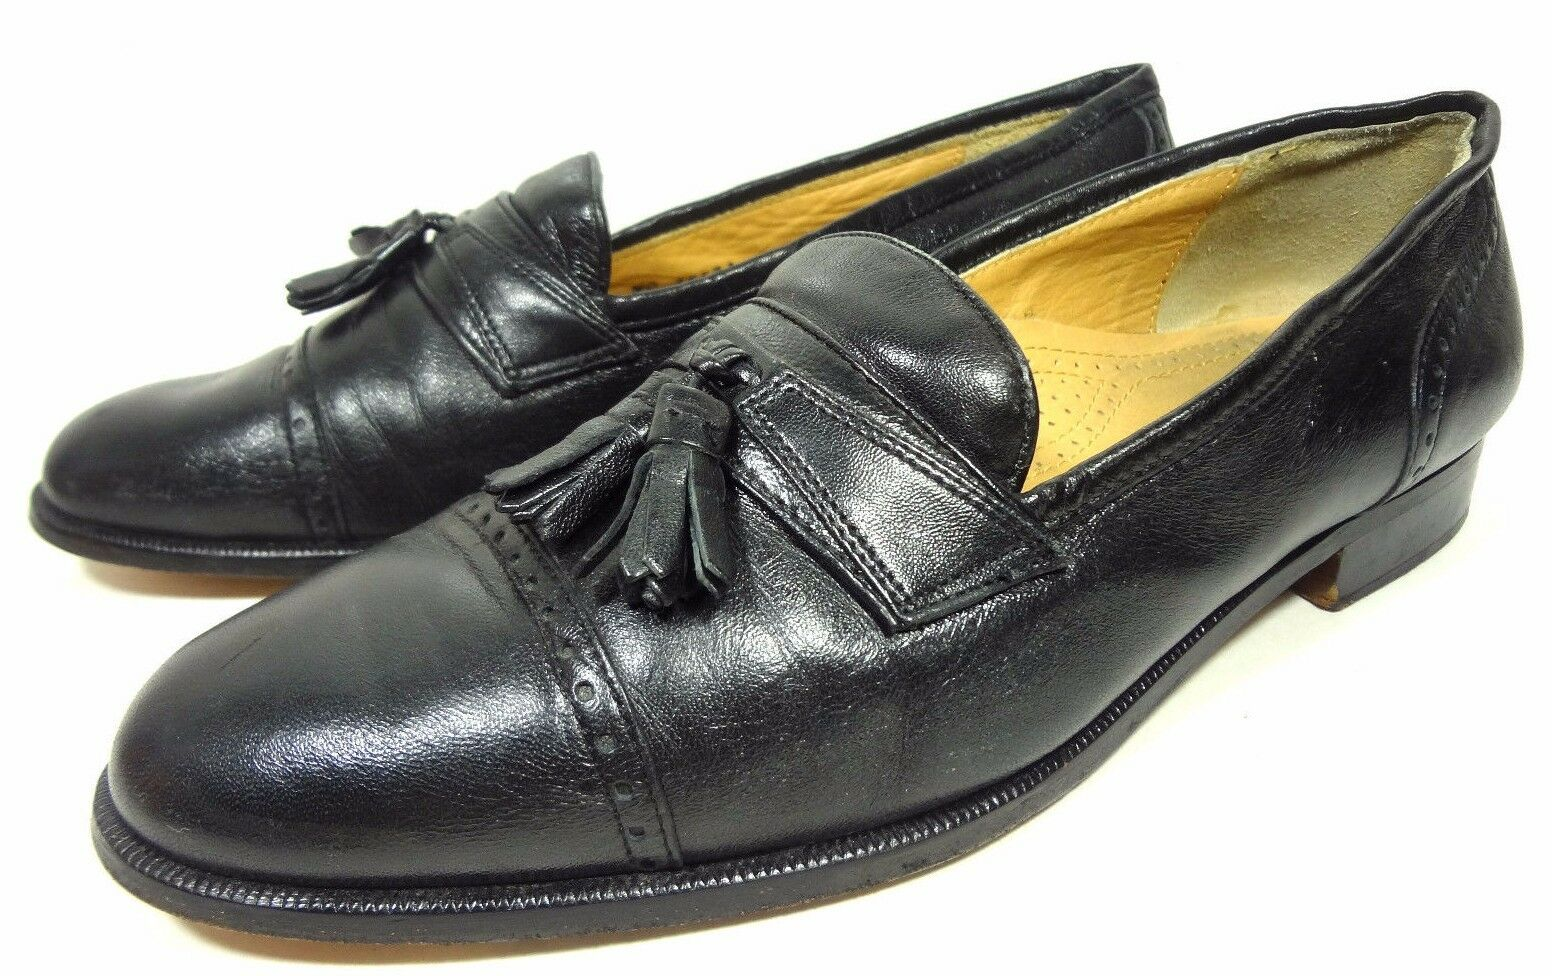 Pierre Cardin  Espace  Mens Black Loafers Tassel Leather shoes 9.5 D